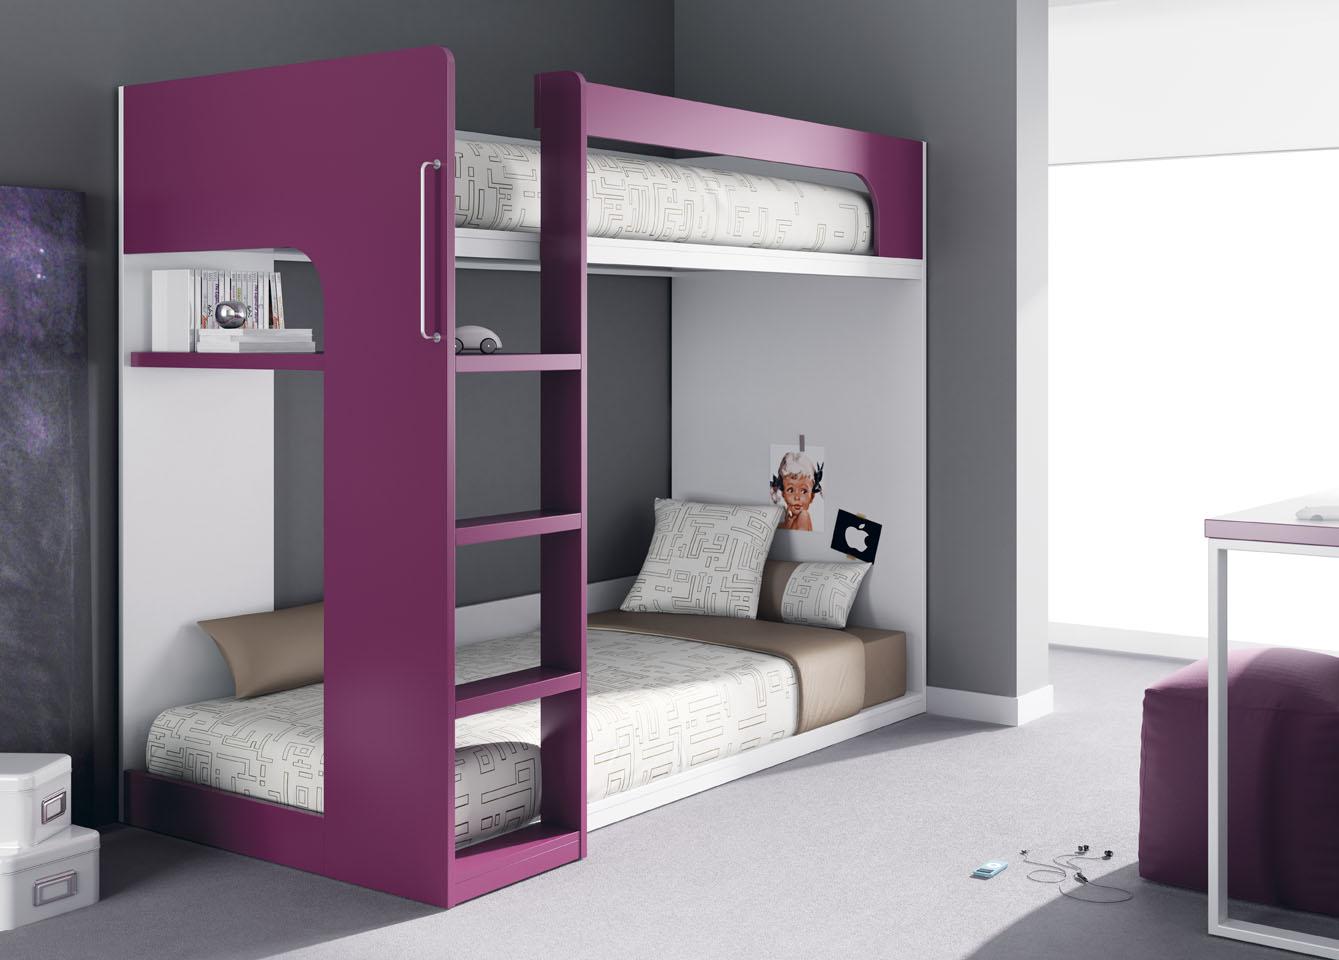 lits superpos s de meubles ros. Black Bedroom Furniture Sets. Home Design Ideas